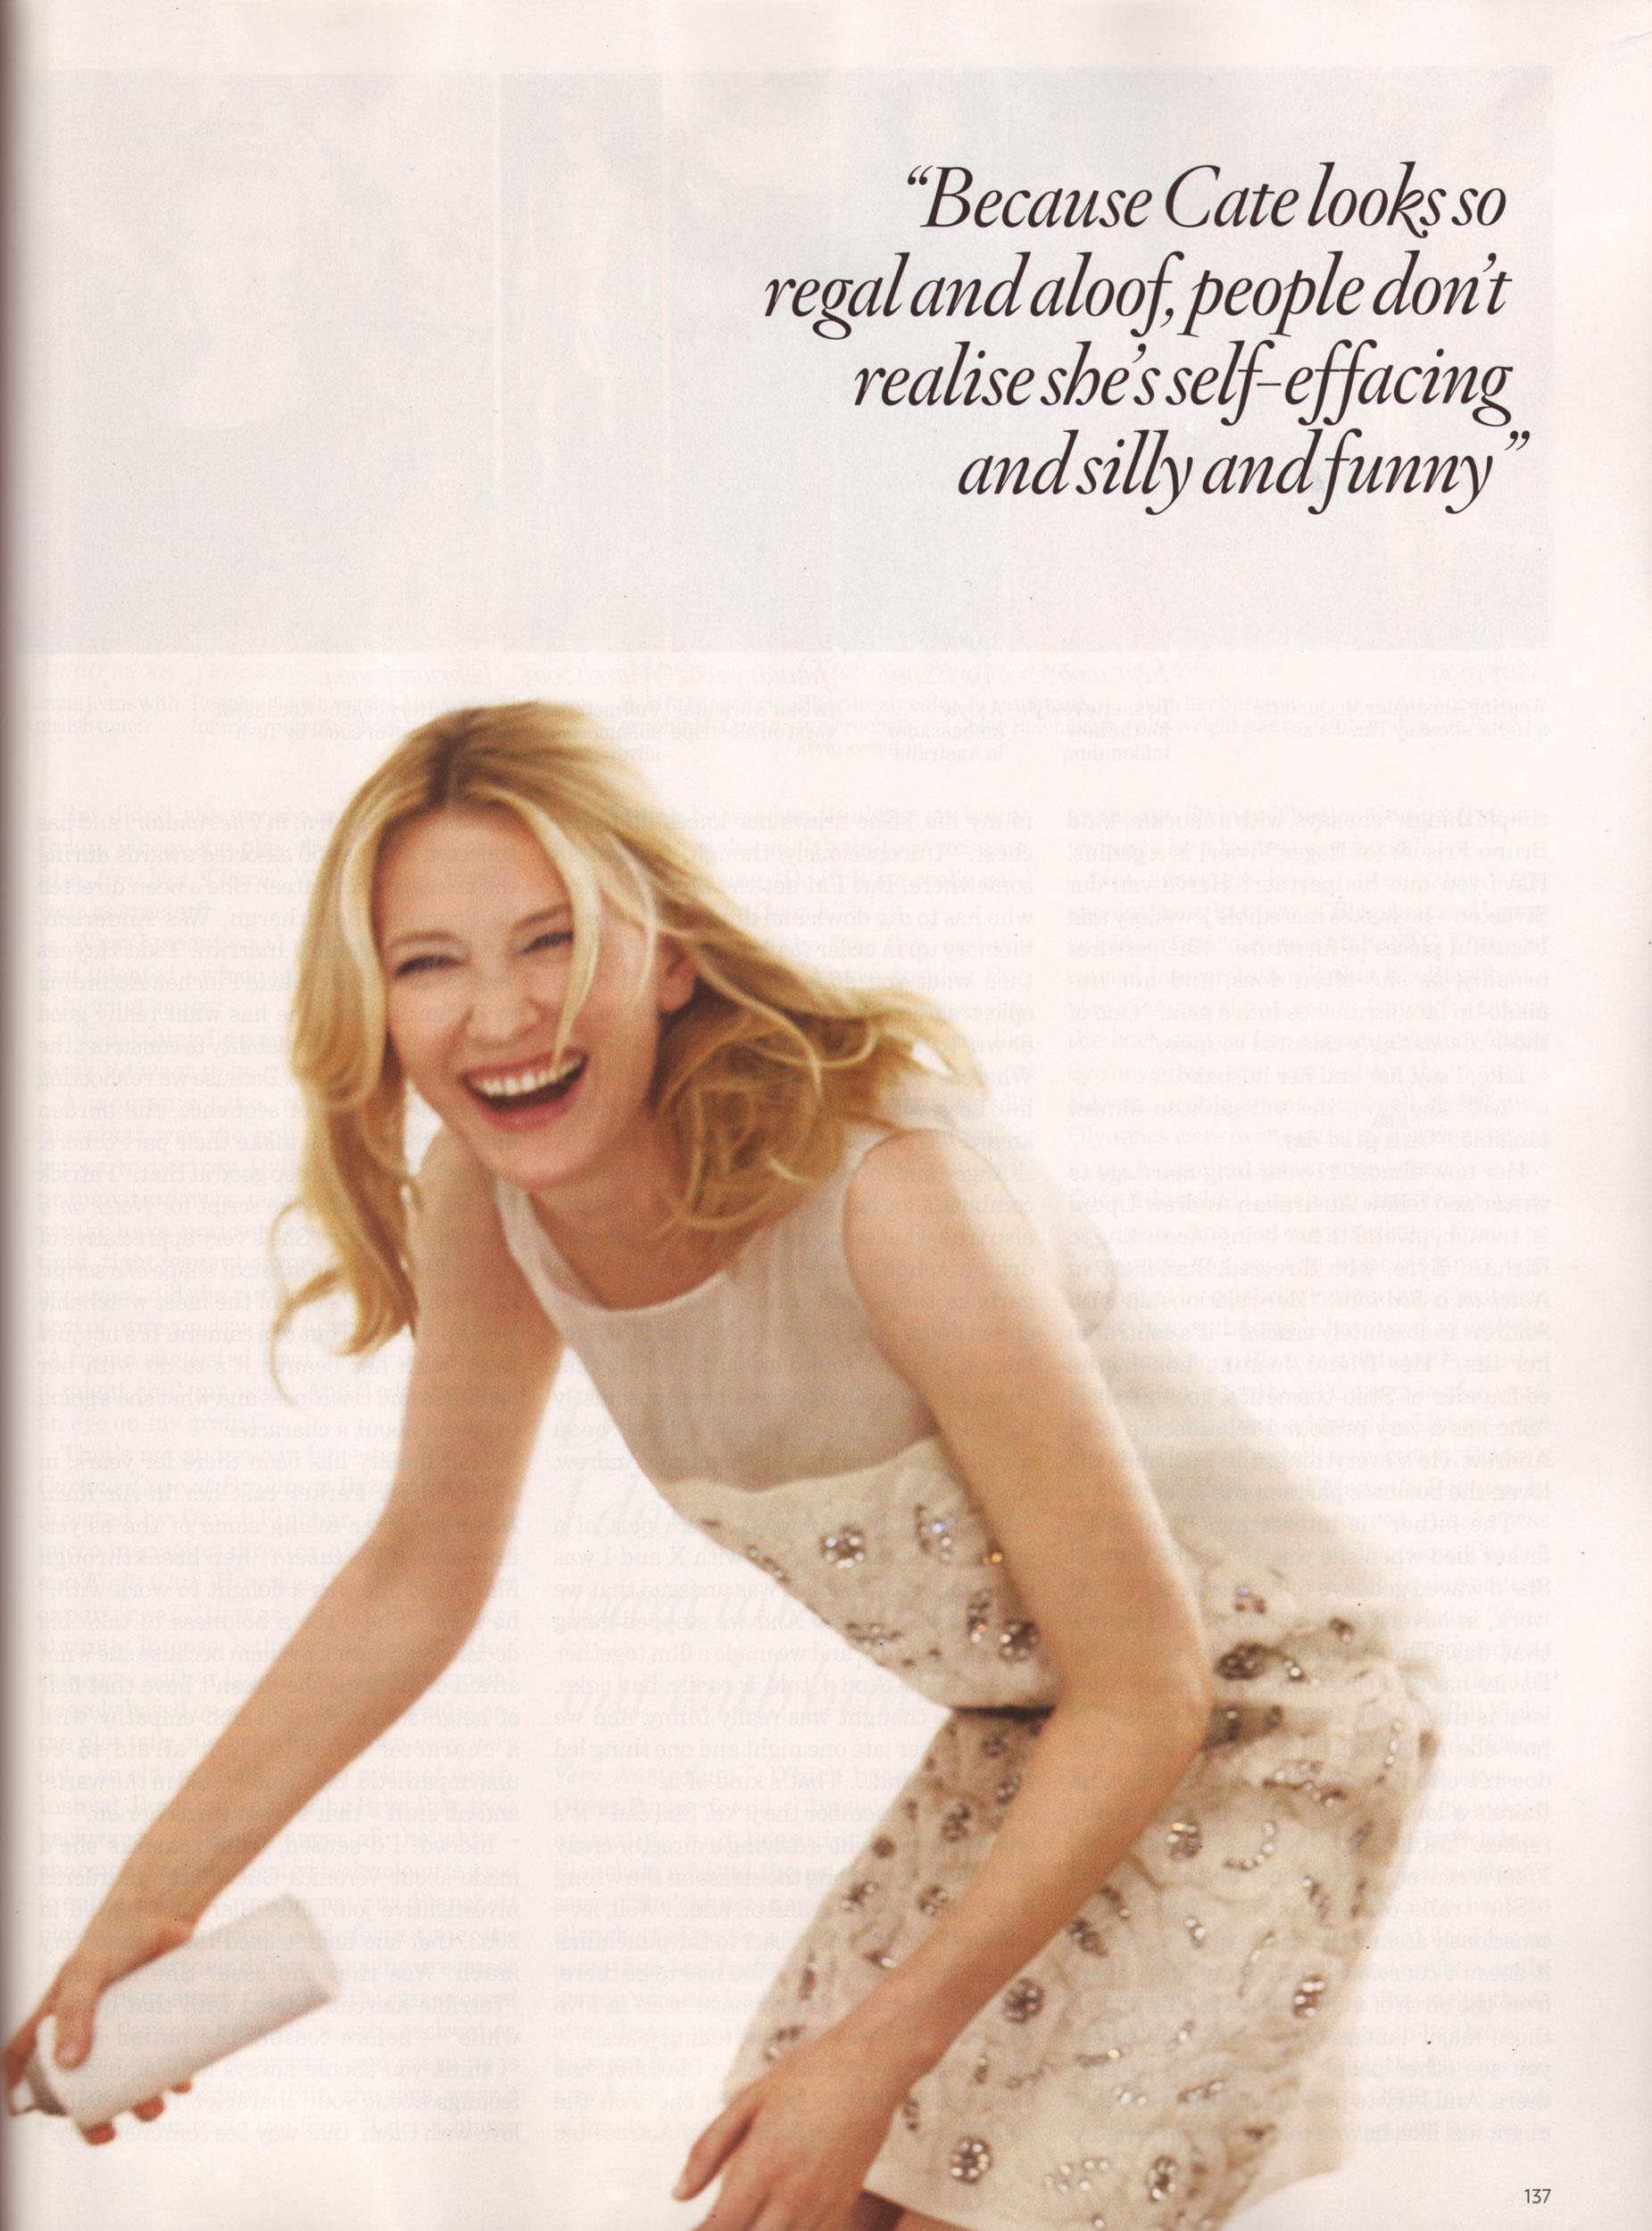 Fotos De Cate Blanchett Desnuda Página 9 Fotos De Famosastk